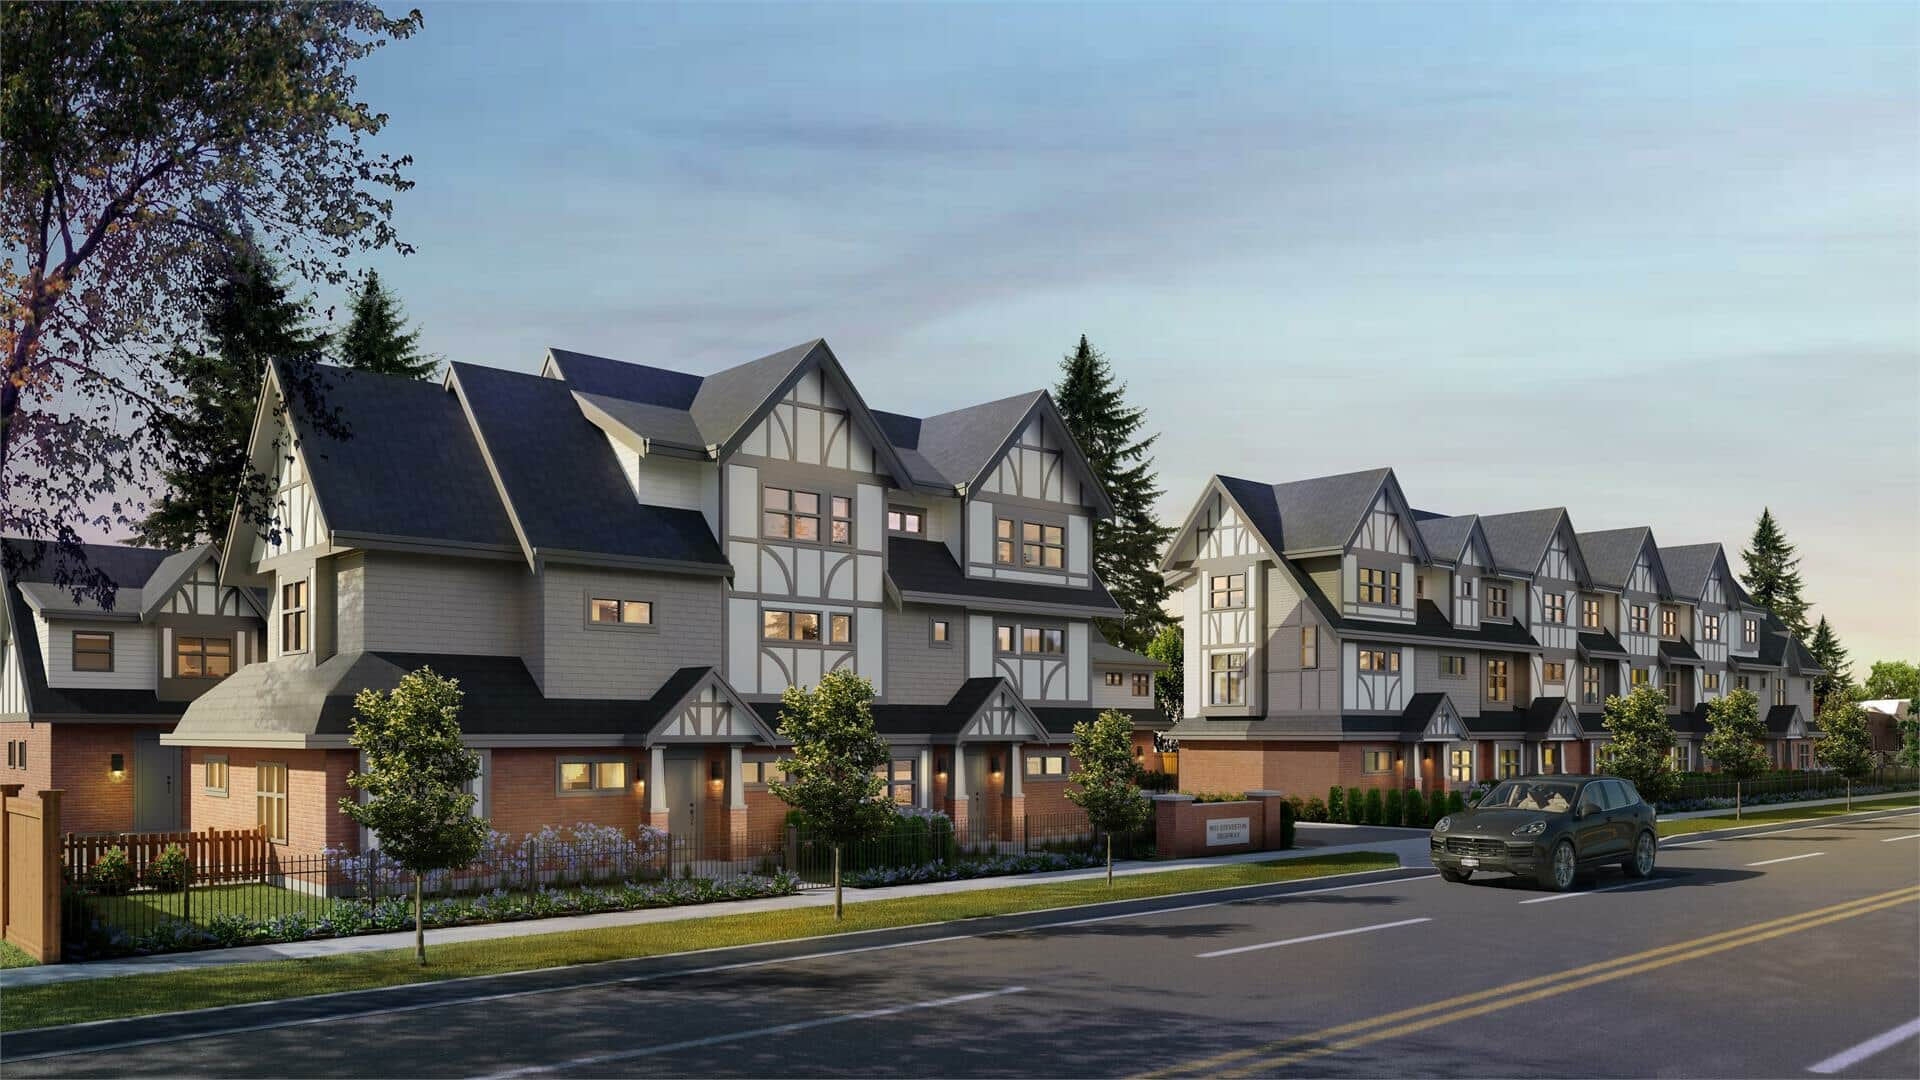 Diamond Steveston By Konic Homes – Availability, Prices, Plans